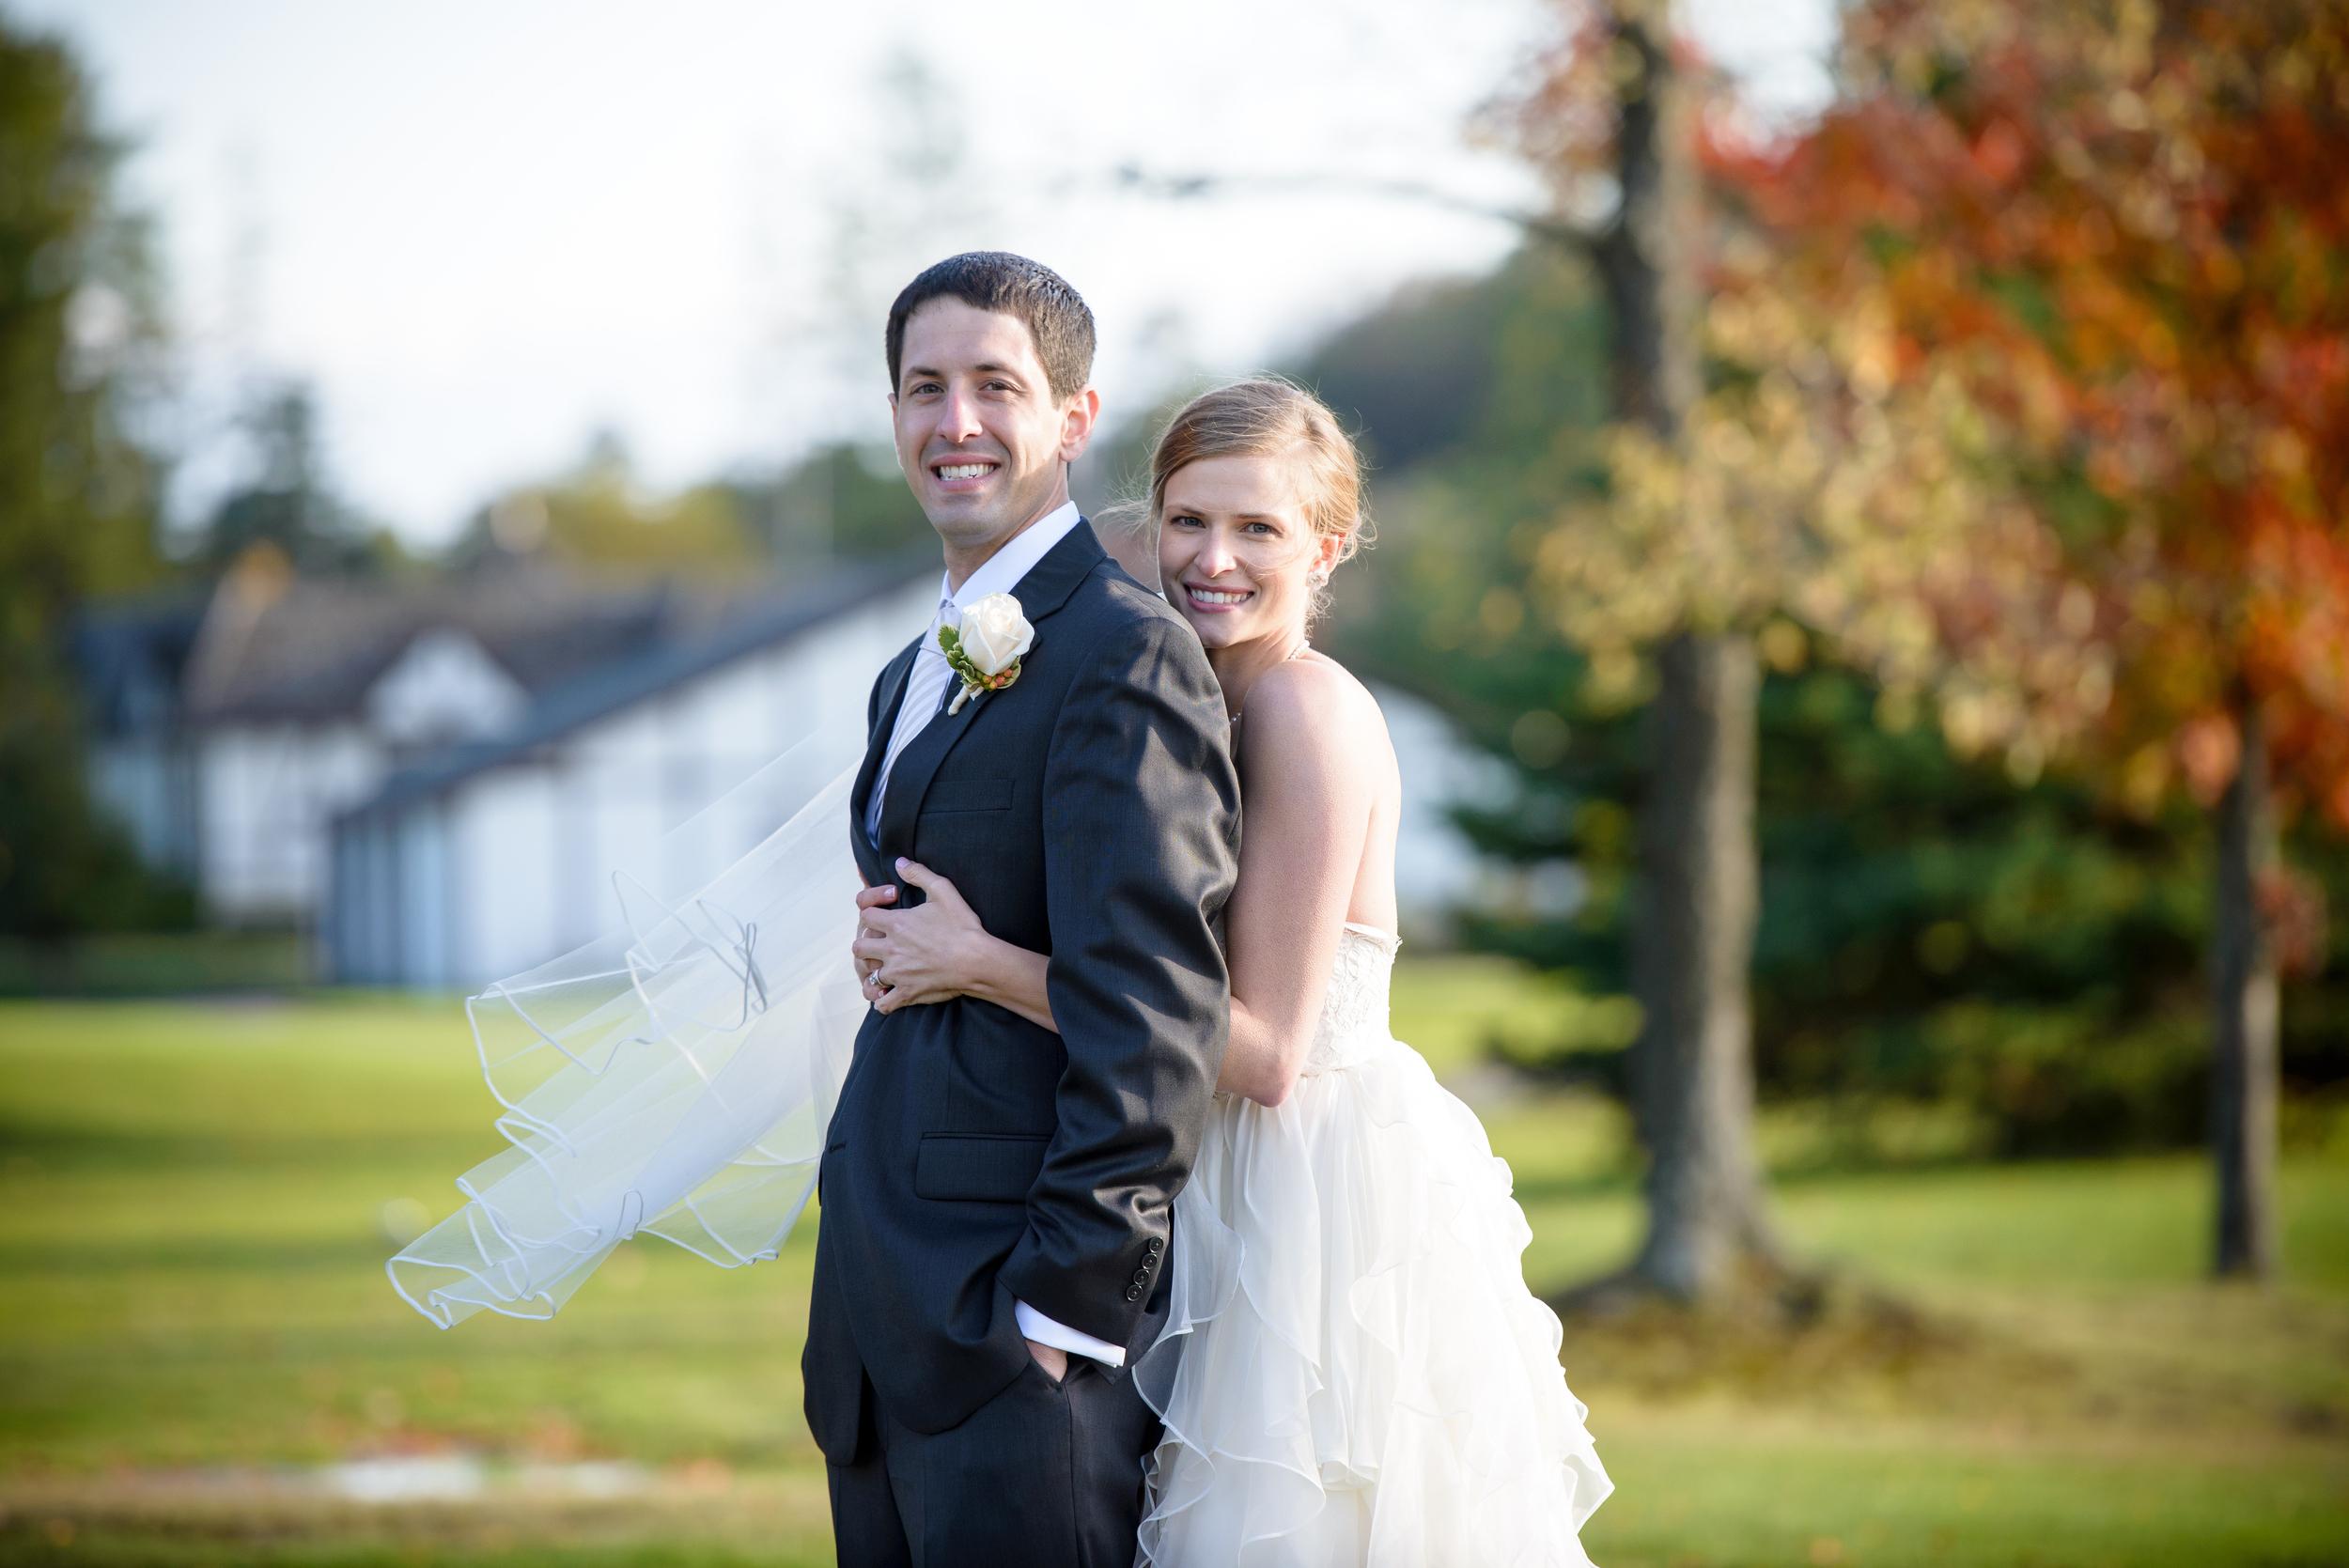 Rachel_Steve_Rustic_Wedding_15.jpg